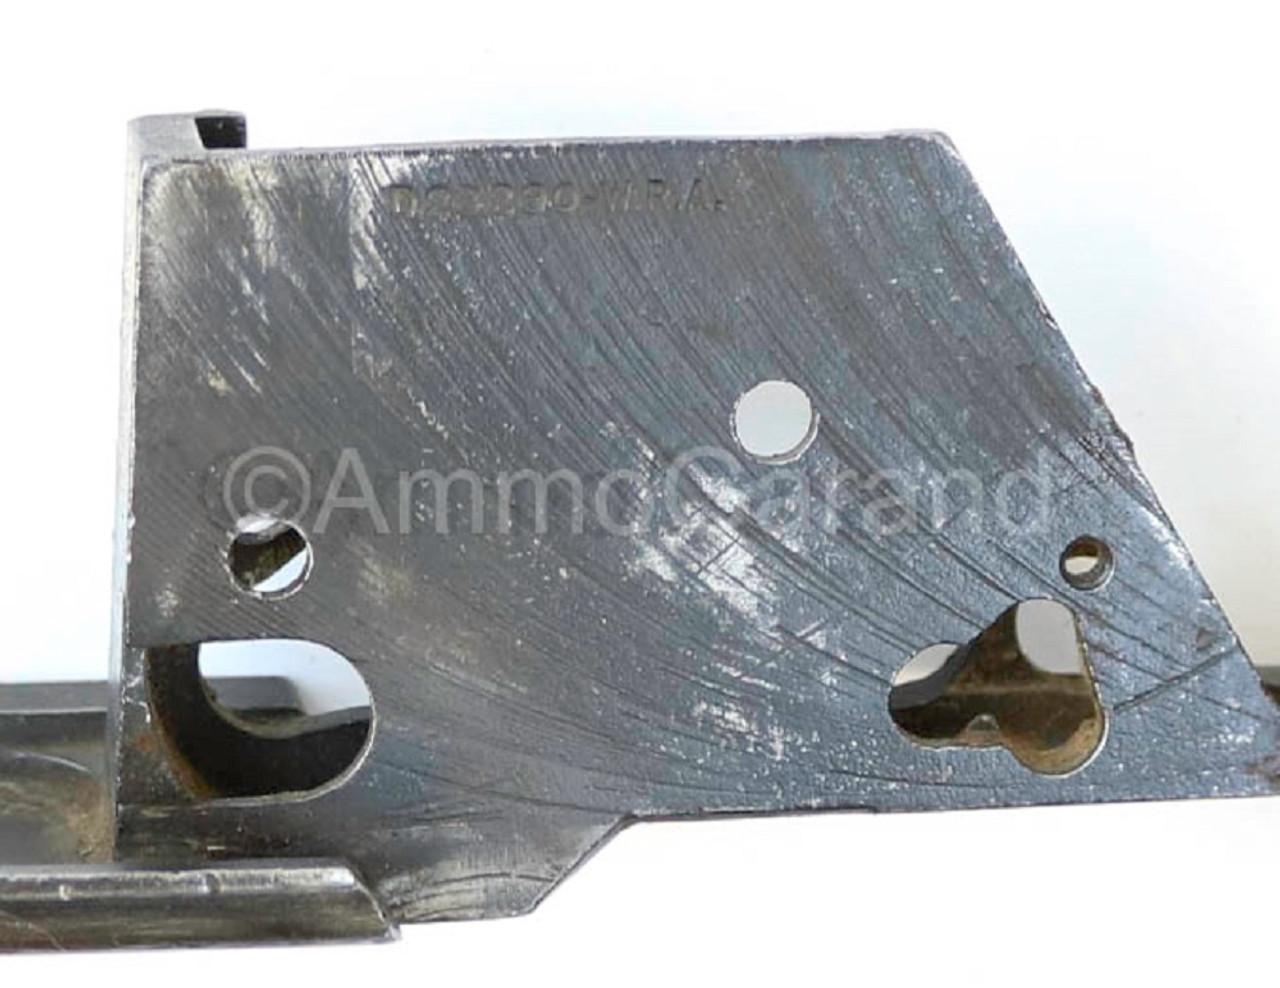 M1 Garand Winchester Trigger Housing D28290-W.R.A. Cloverleaf Hole w/ Small Pad Mid '43 on use